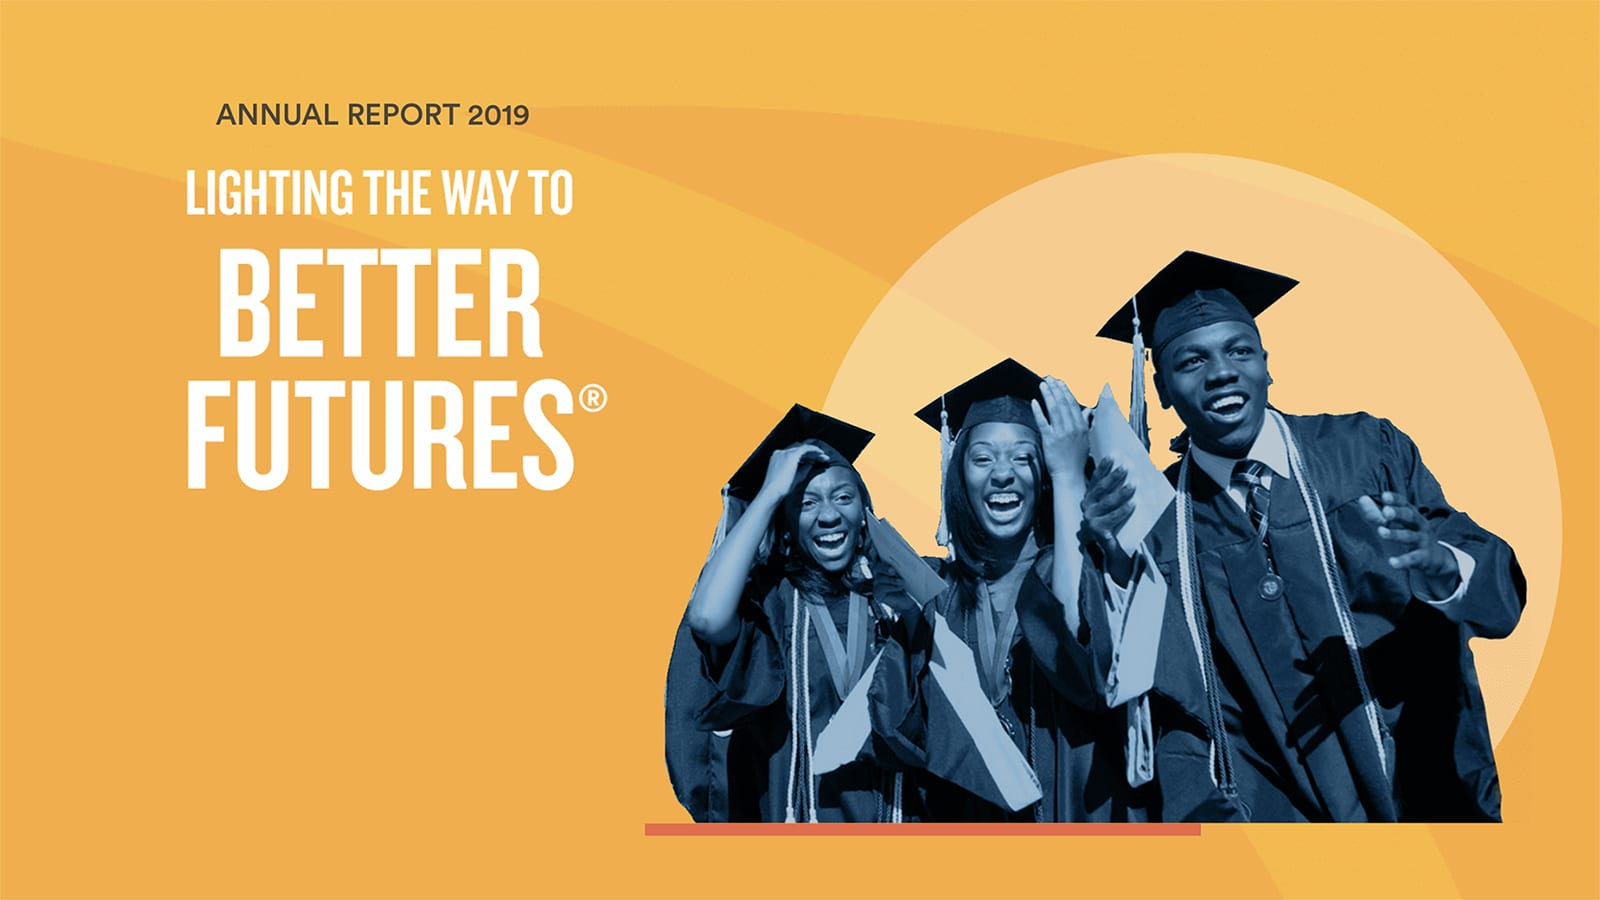 Annual Report hero banner